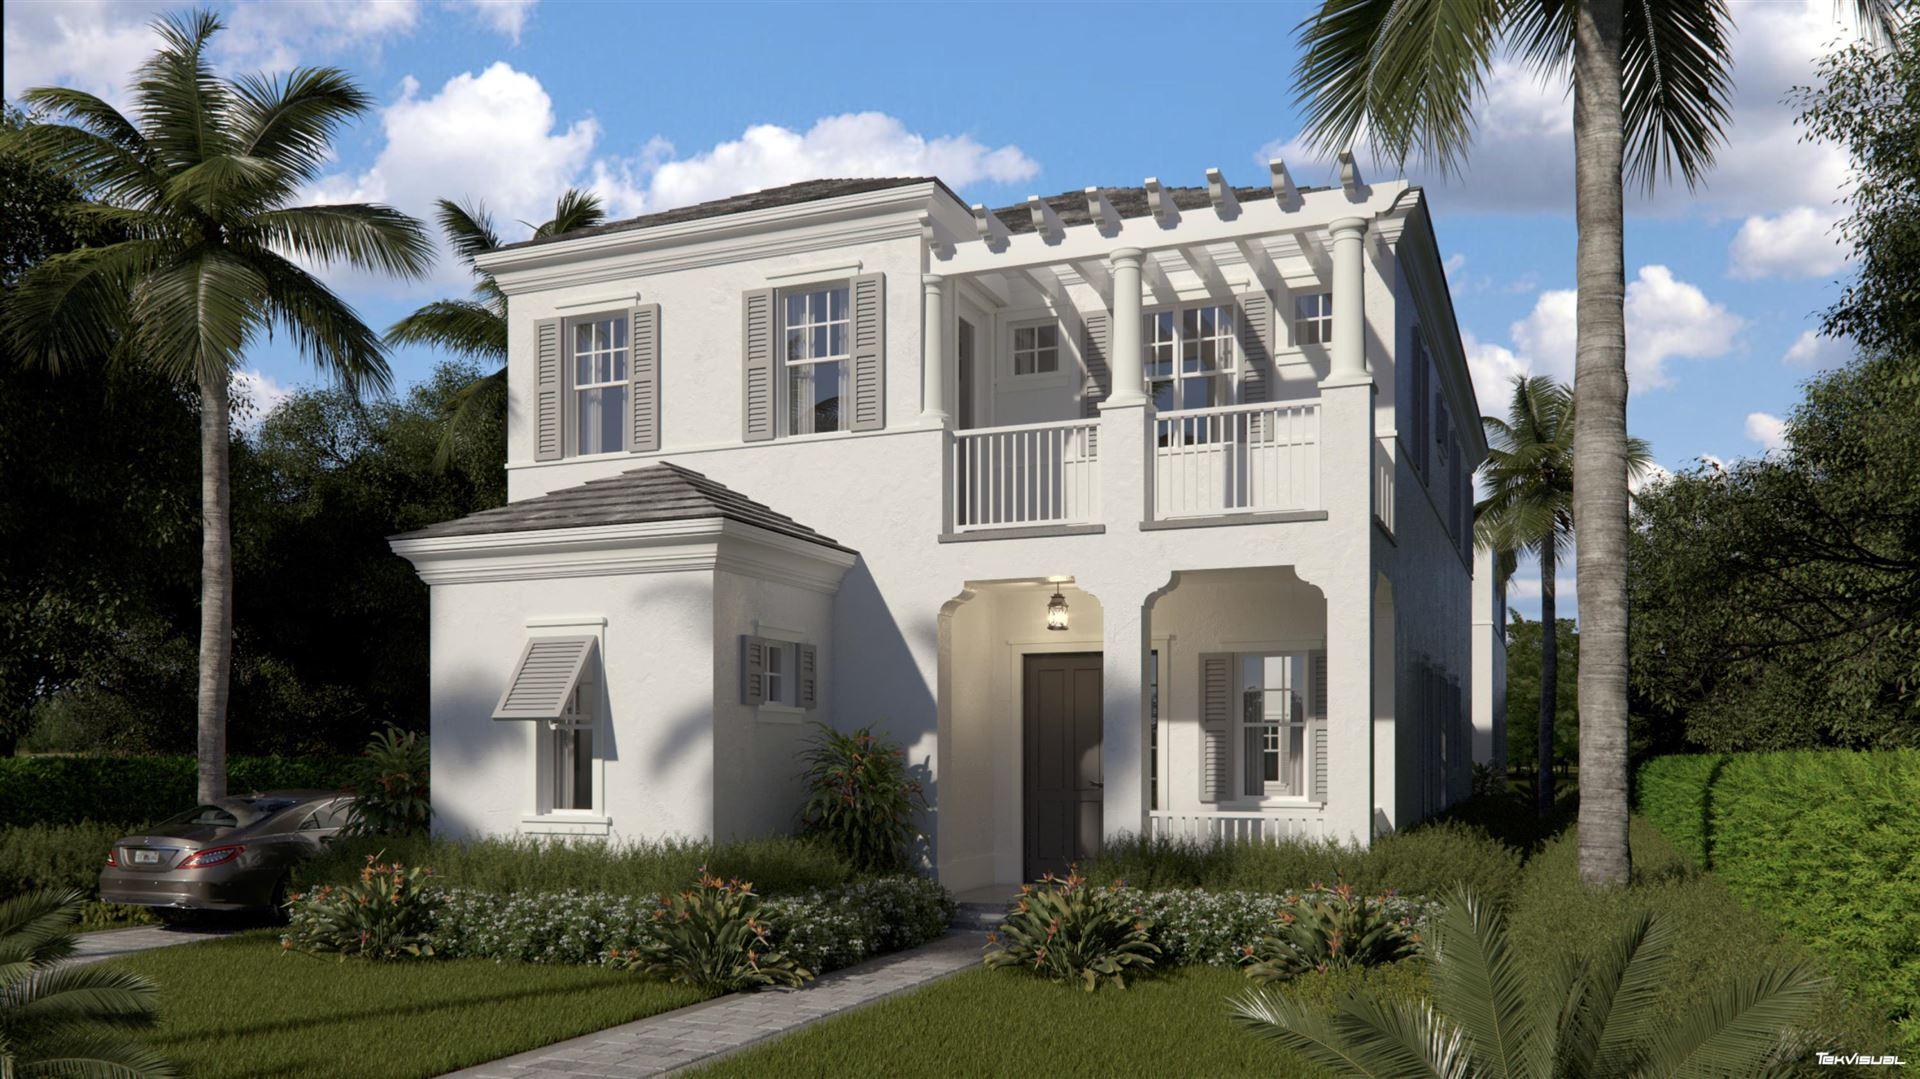 713 N Lake Avenue, Delray Beach, FL 33483 - MLS#: RX-10688957